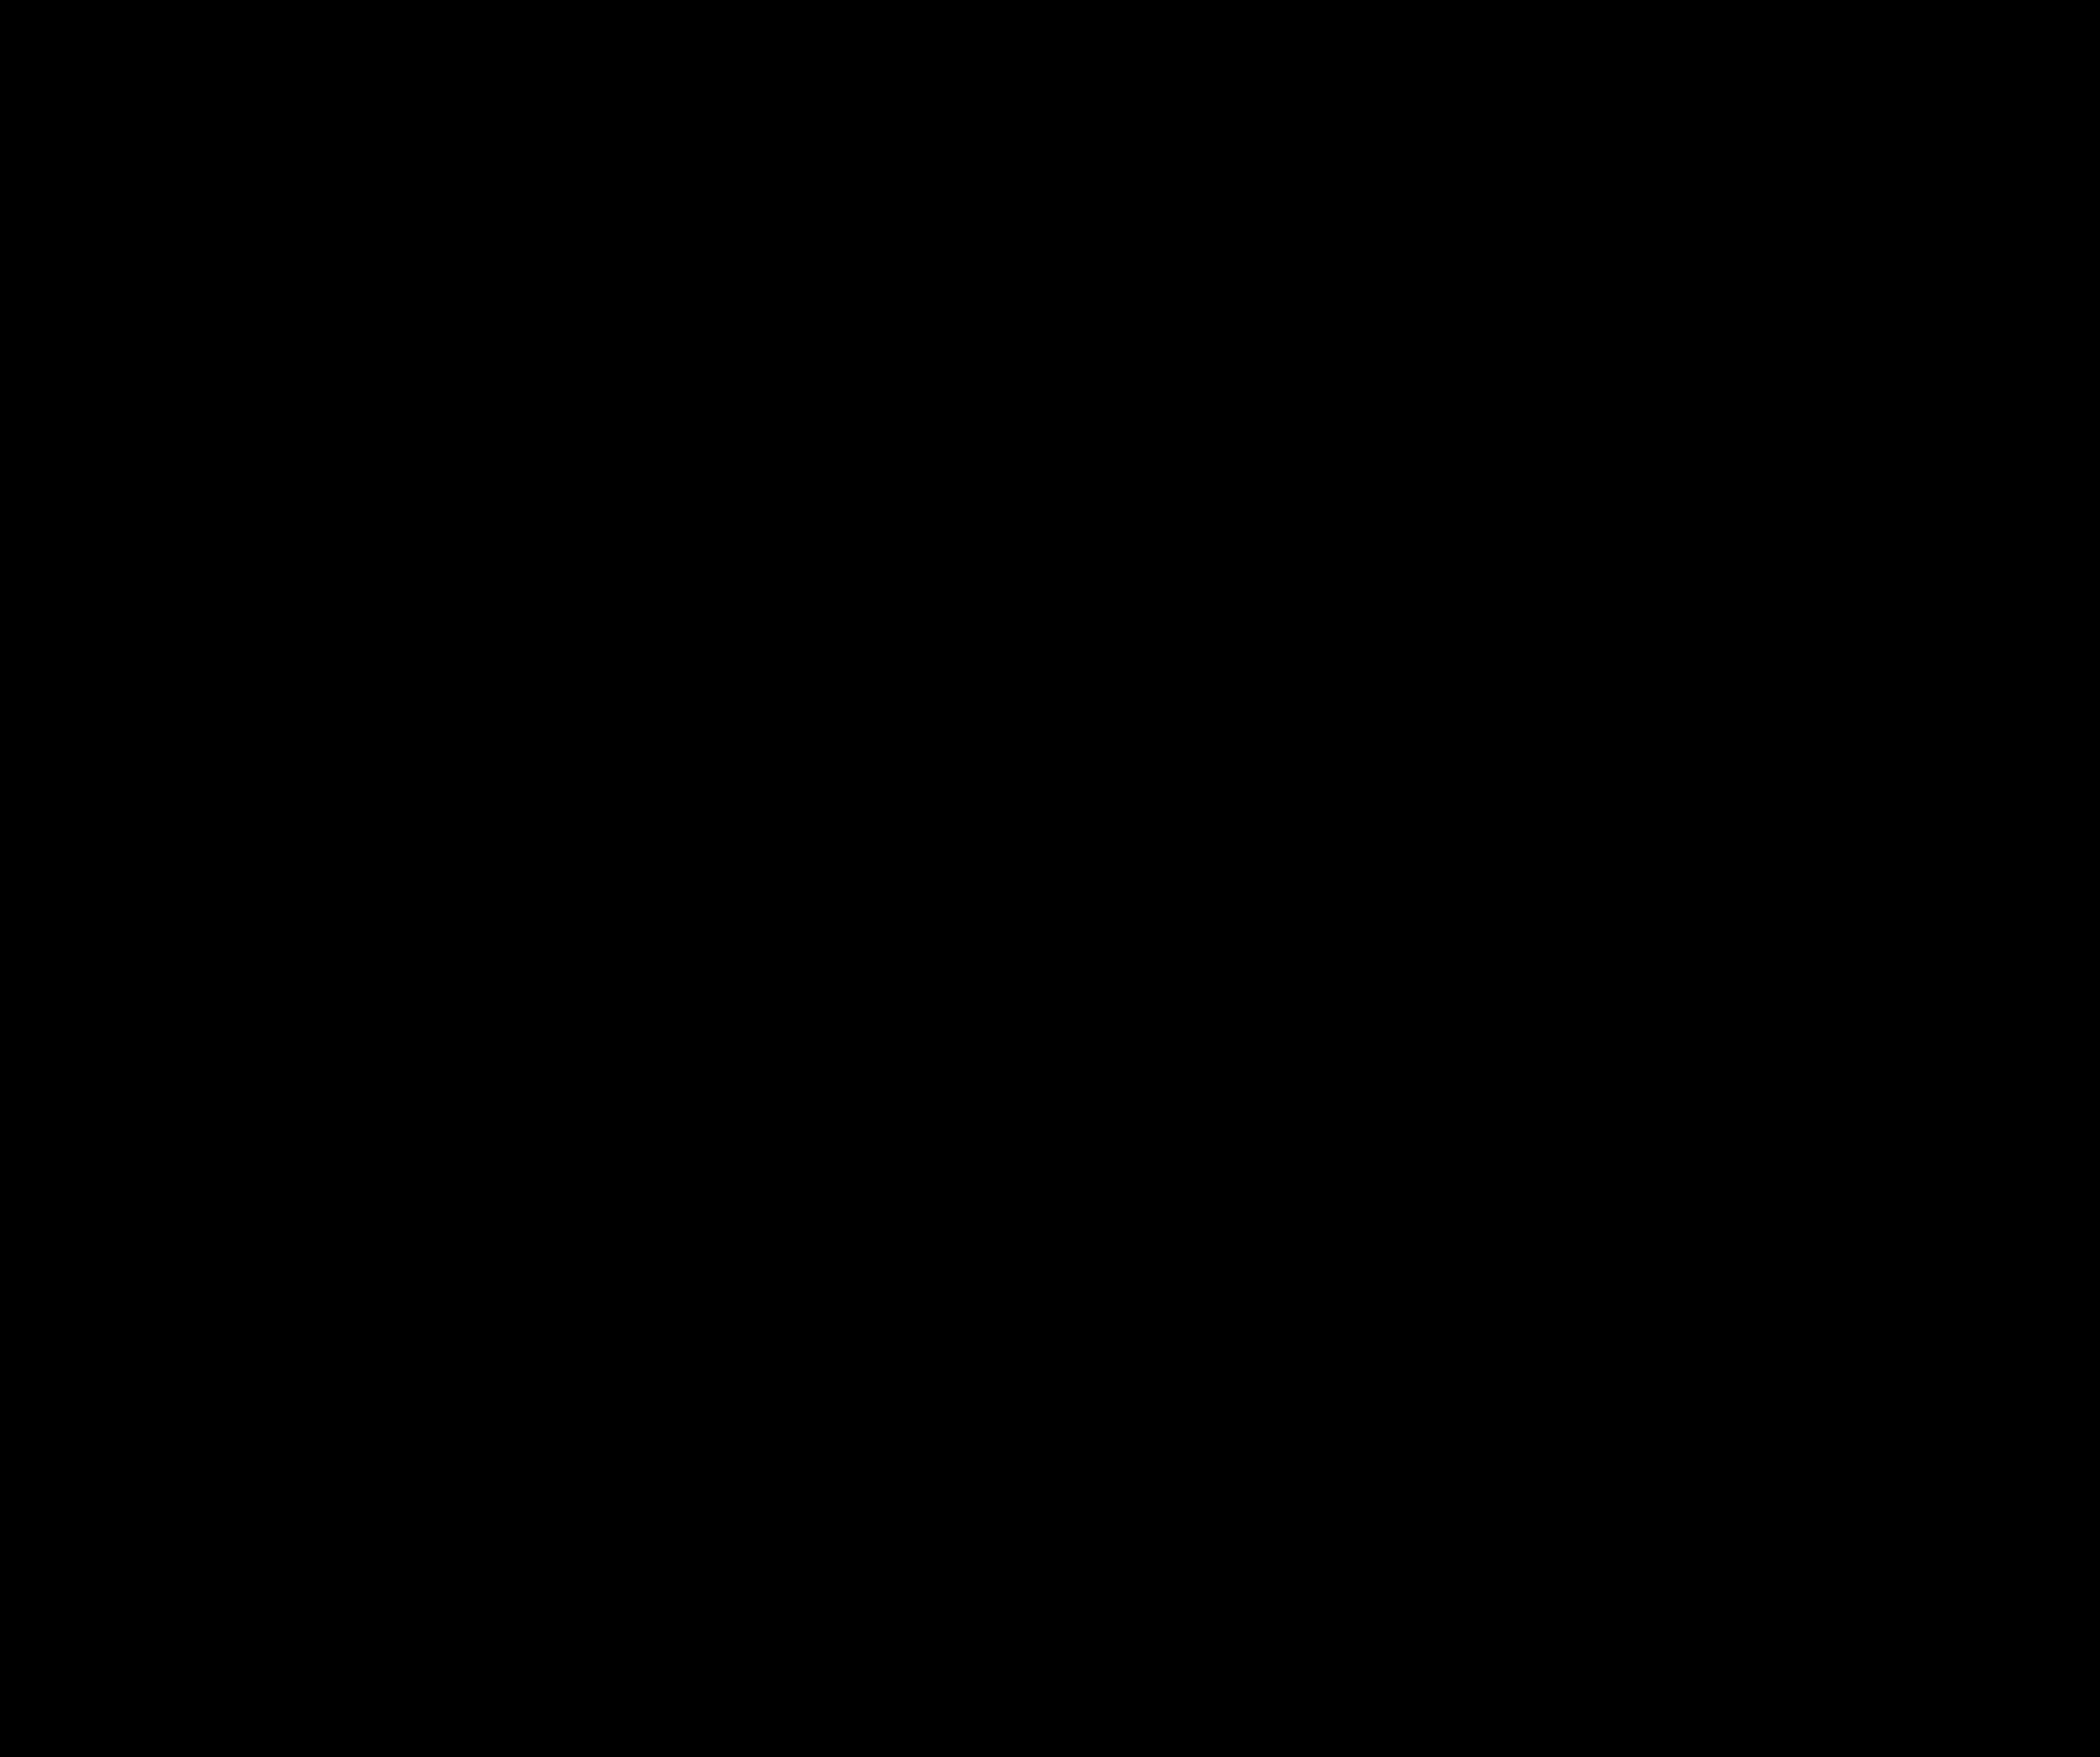 nissan logo 1 1 - Nissan Logo